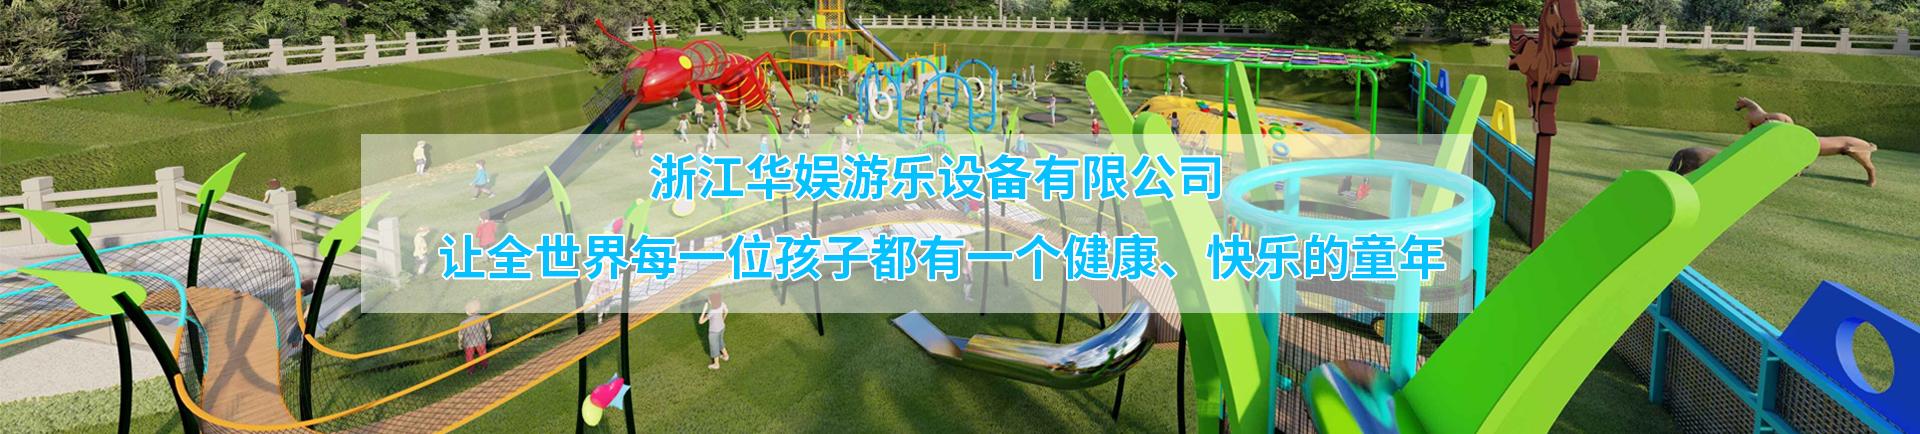 http://cdn.xypt.top/b2621977/21/01/25b1b9a7a76422940f108b85b0fcab41d0fcb063.jpg